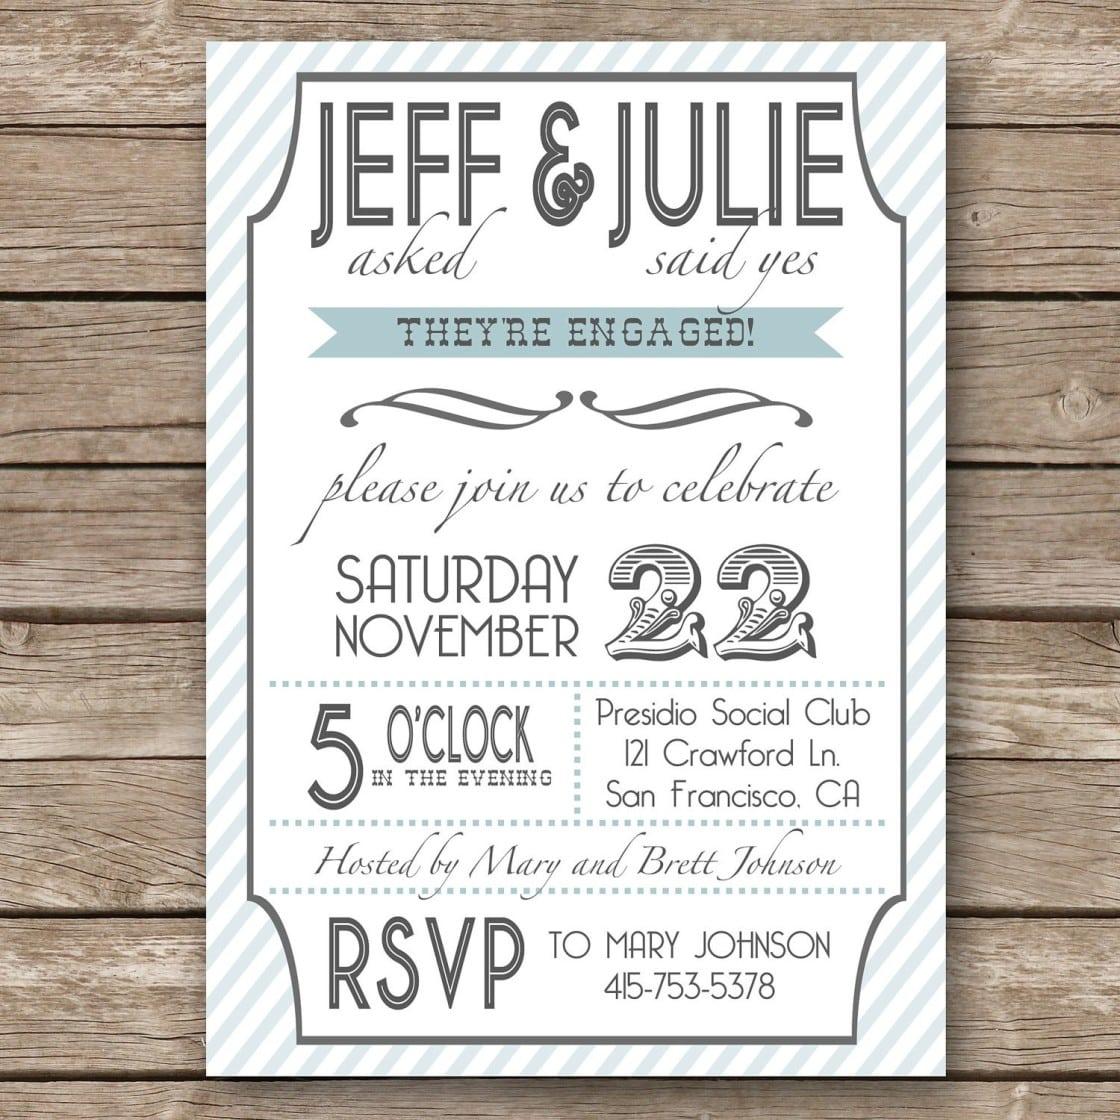 Engagement Party Invitation Wording Ideas – Podpedia Invitation